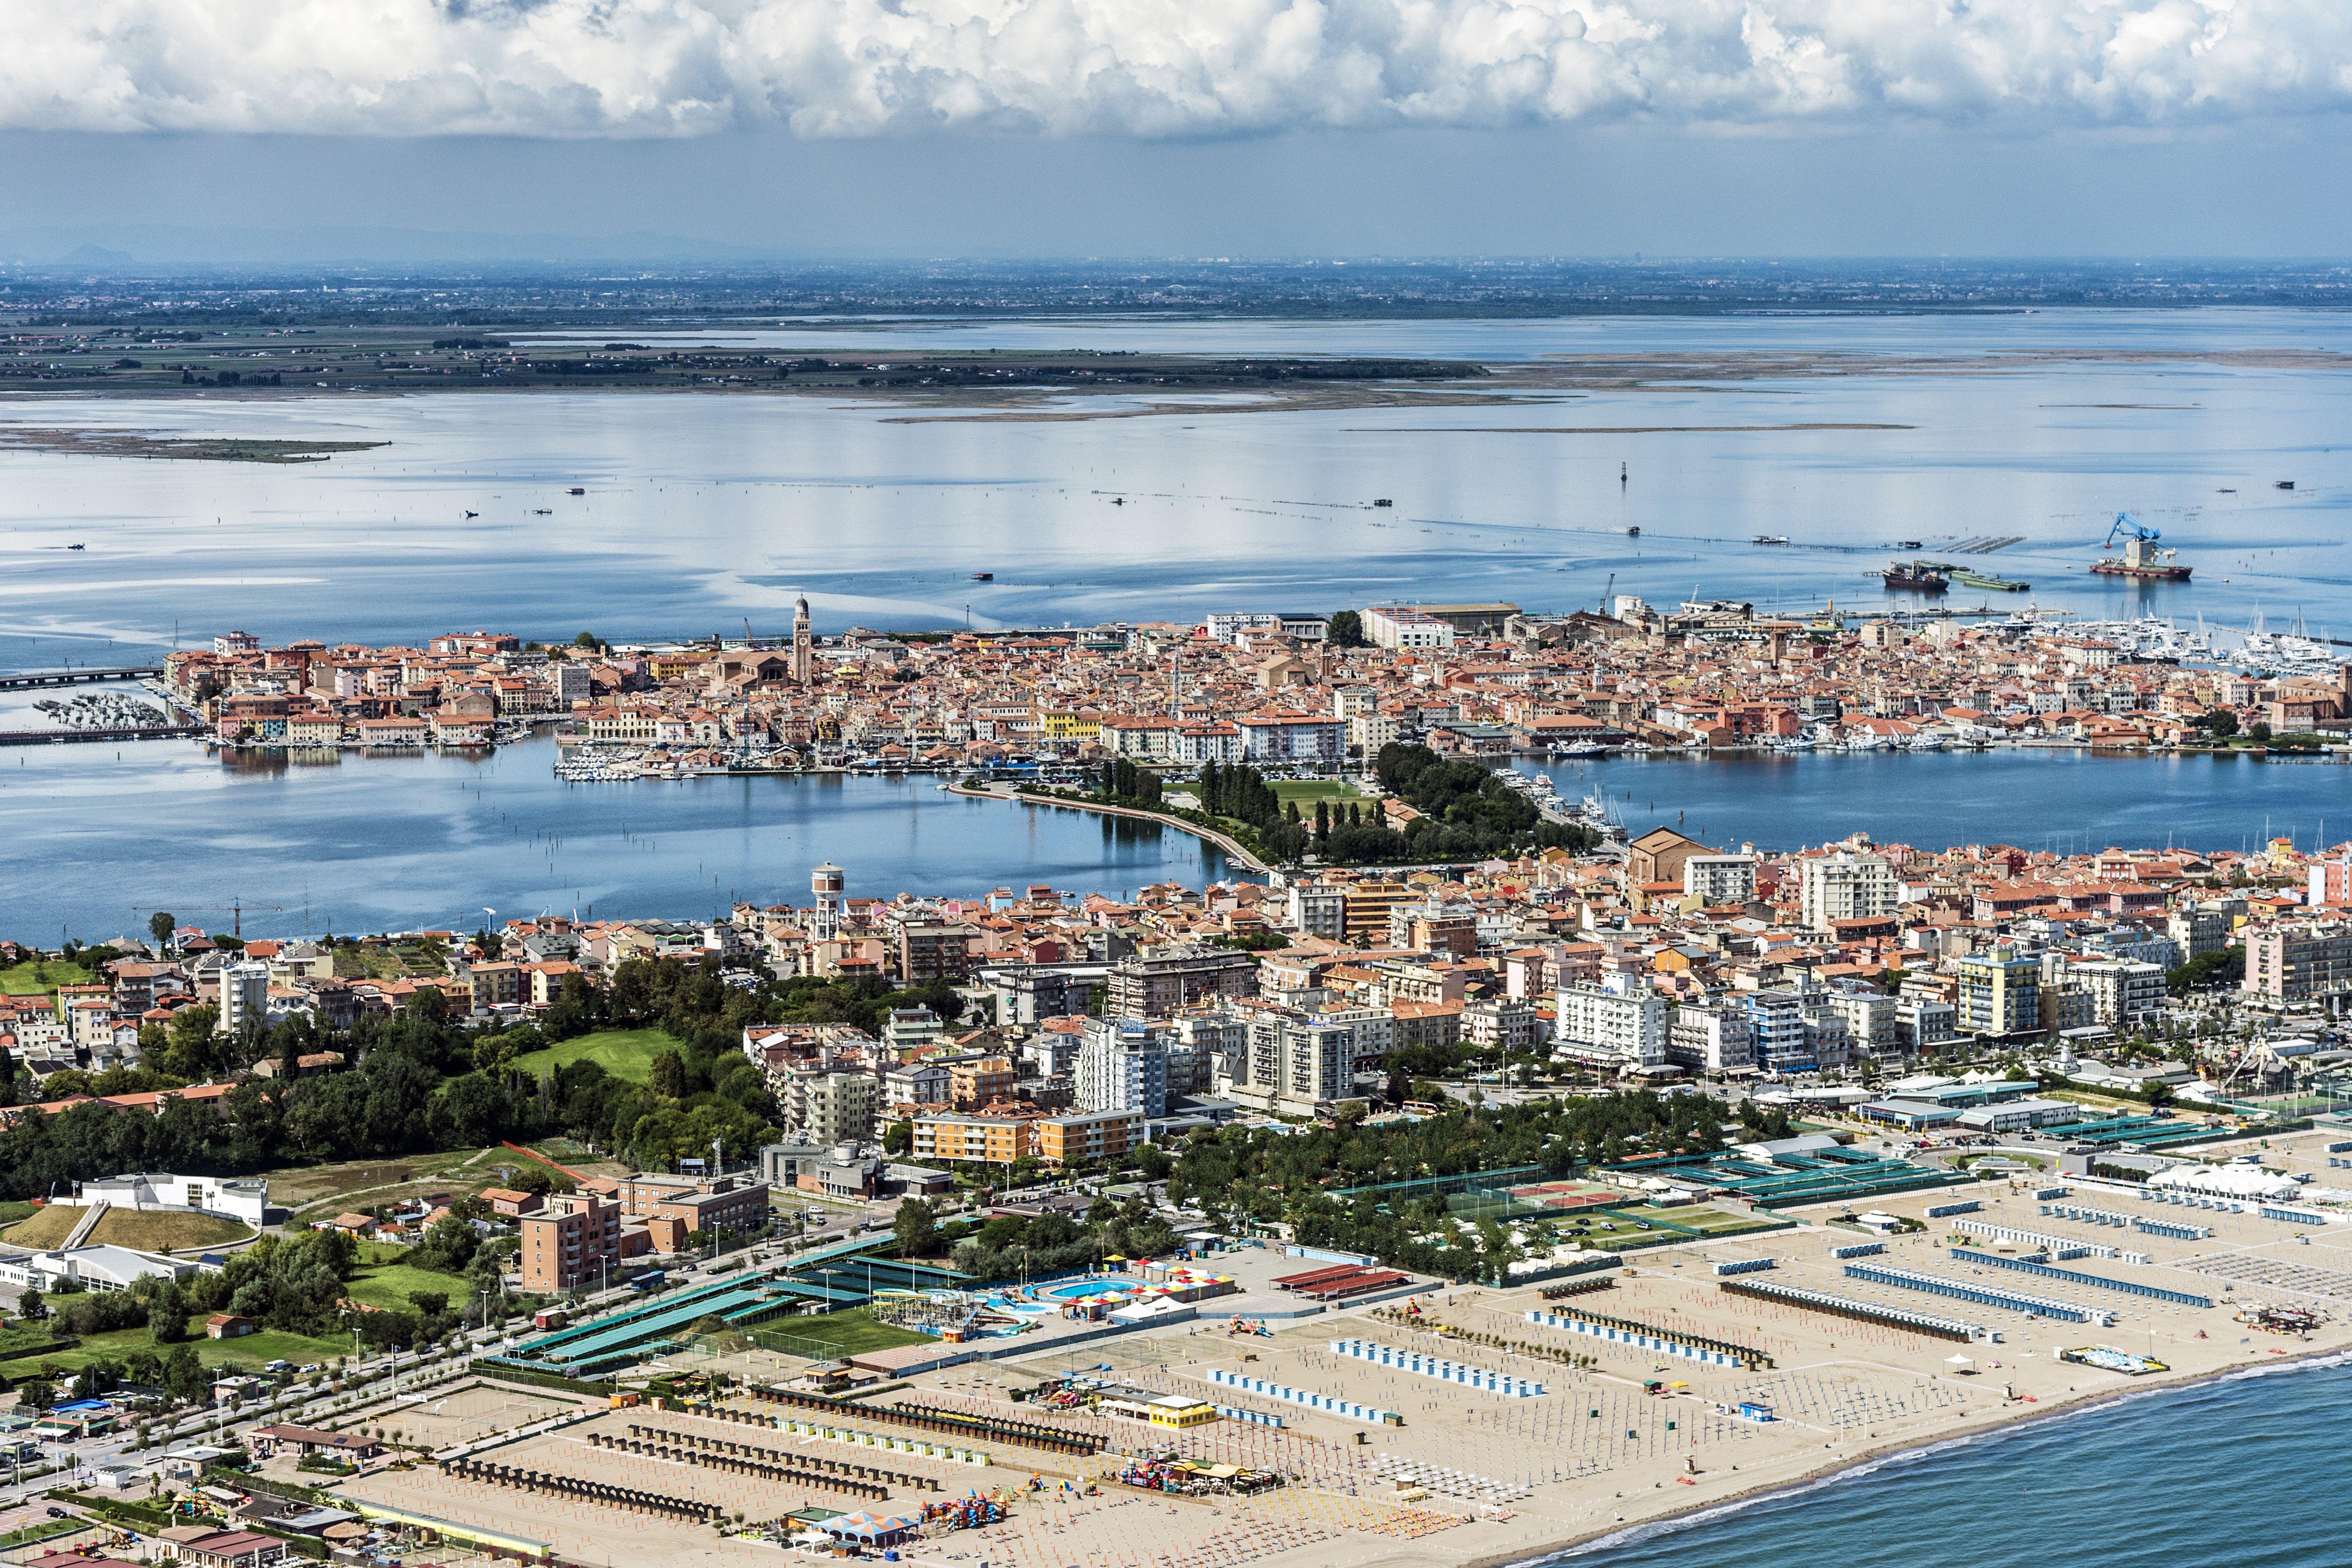 Aerial view of Chioggia, Venetian Lagoon, Italy